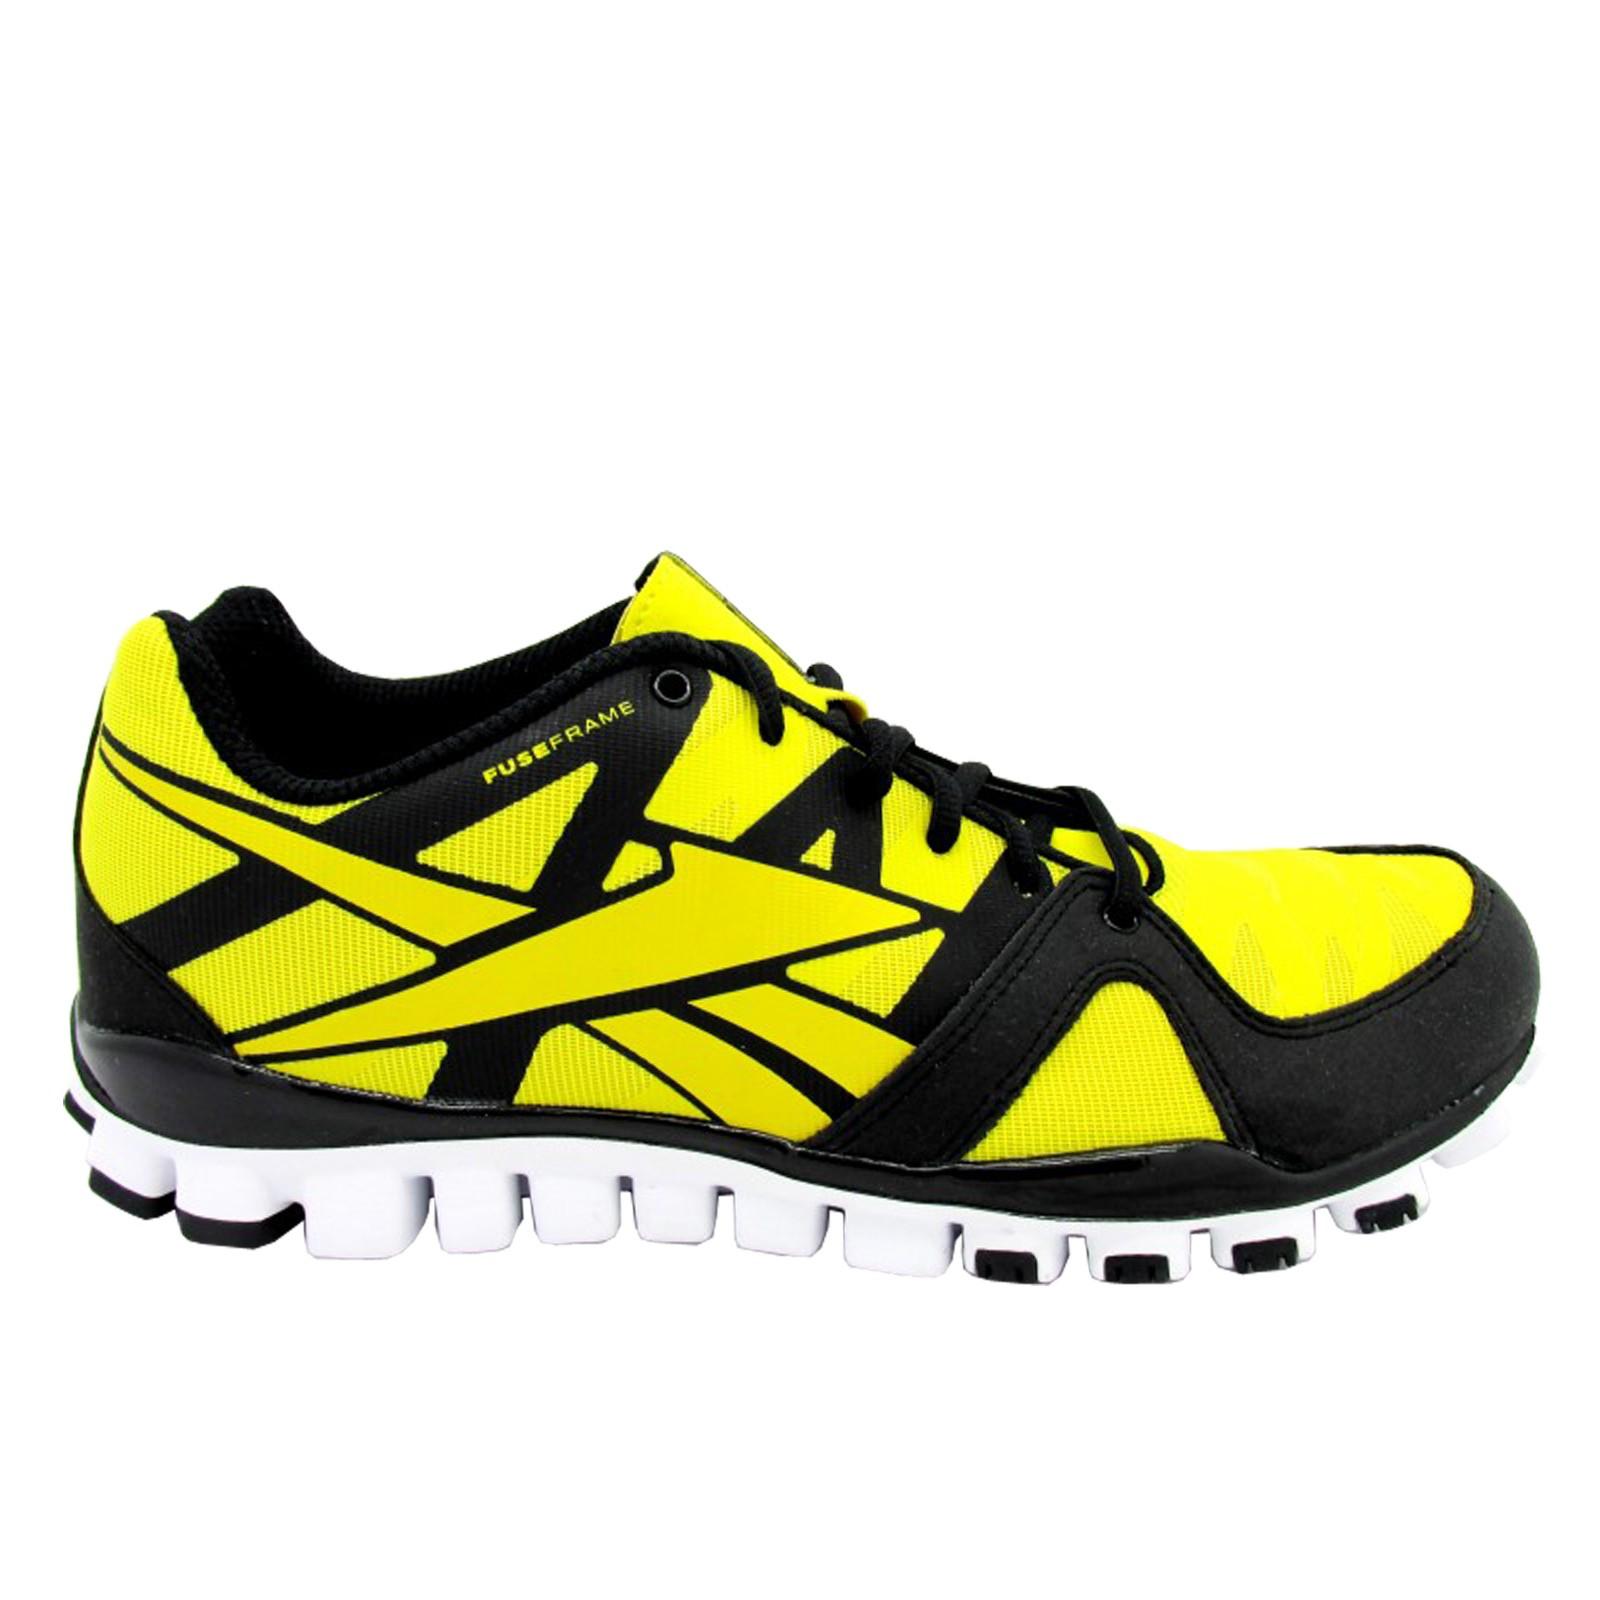 NEU Reebok Realflex Transition 3.0 Trainer RunningShoe Sneakers Men ... f6431985c